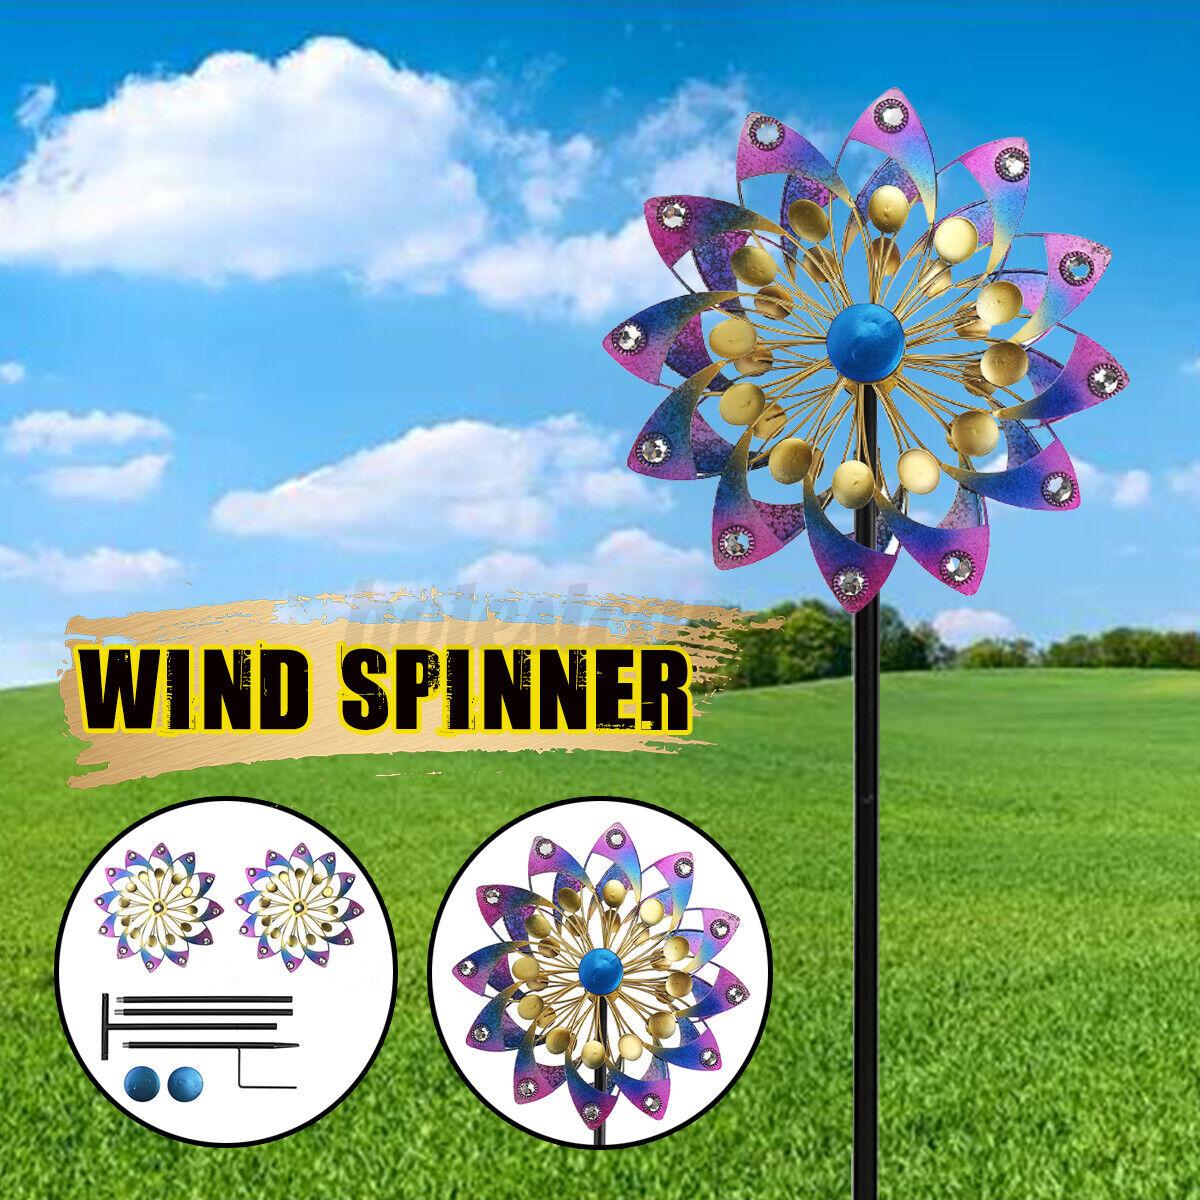 Metal Iron Wind Spinner Windmill Sculpture Yard Lawn Outdoor Decoration Garden